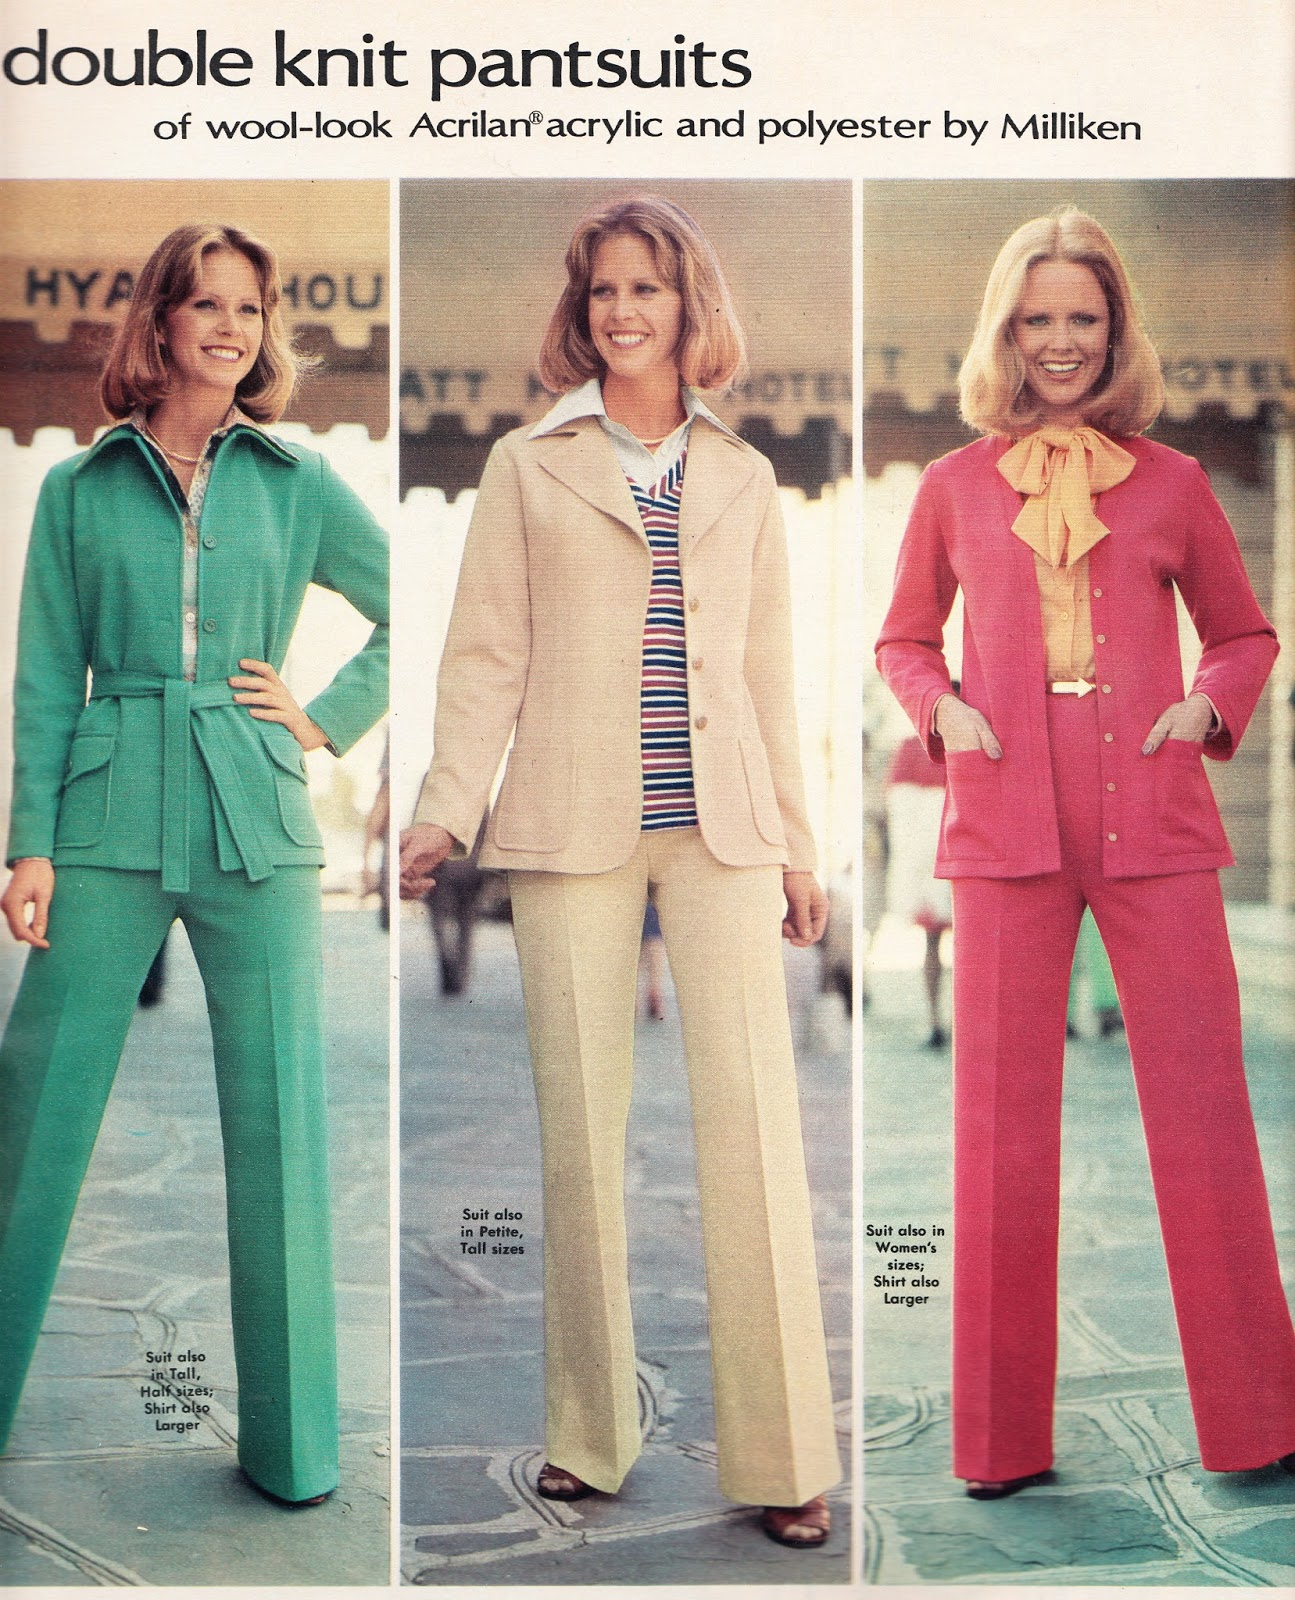 Women's 70s pantsuits